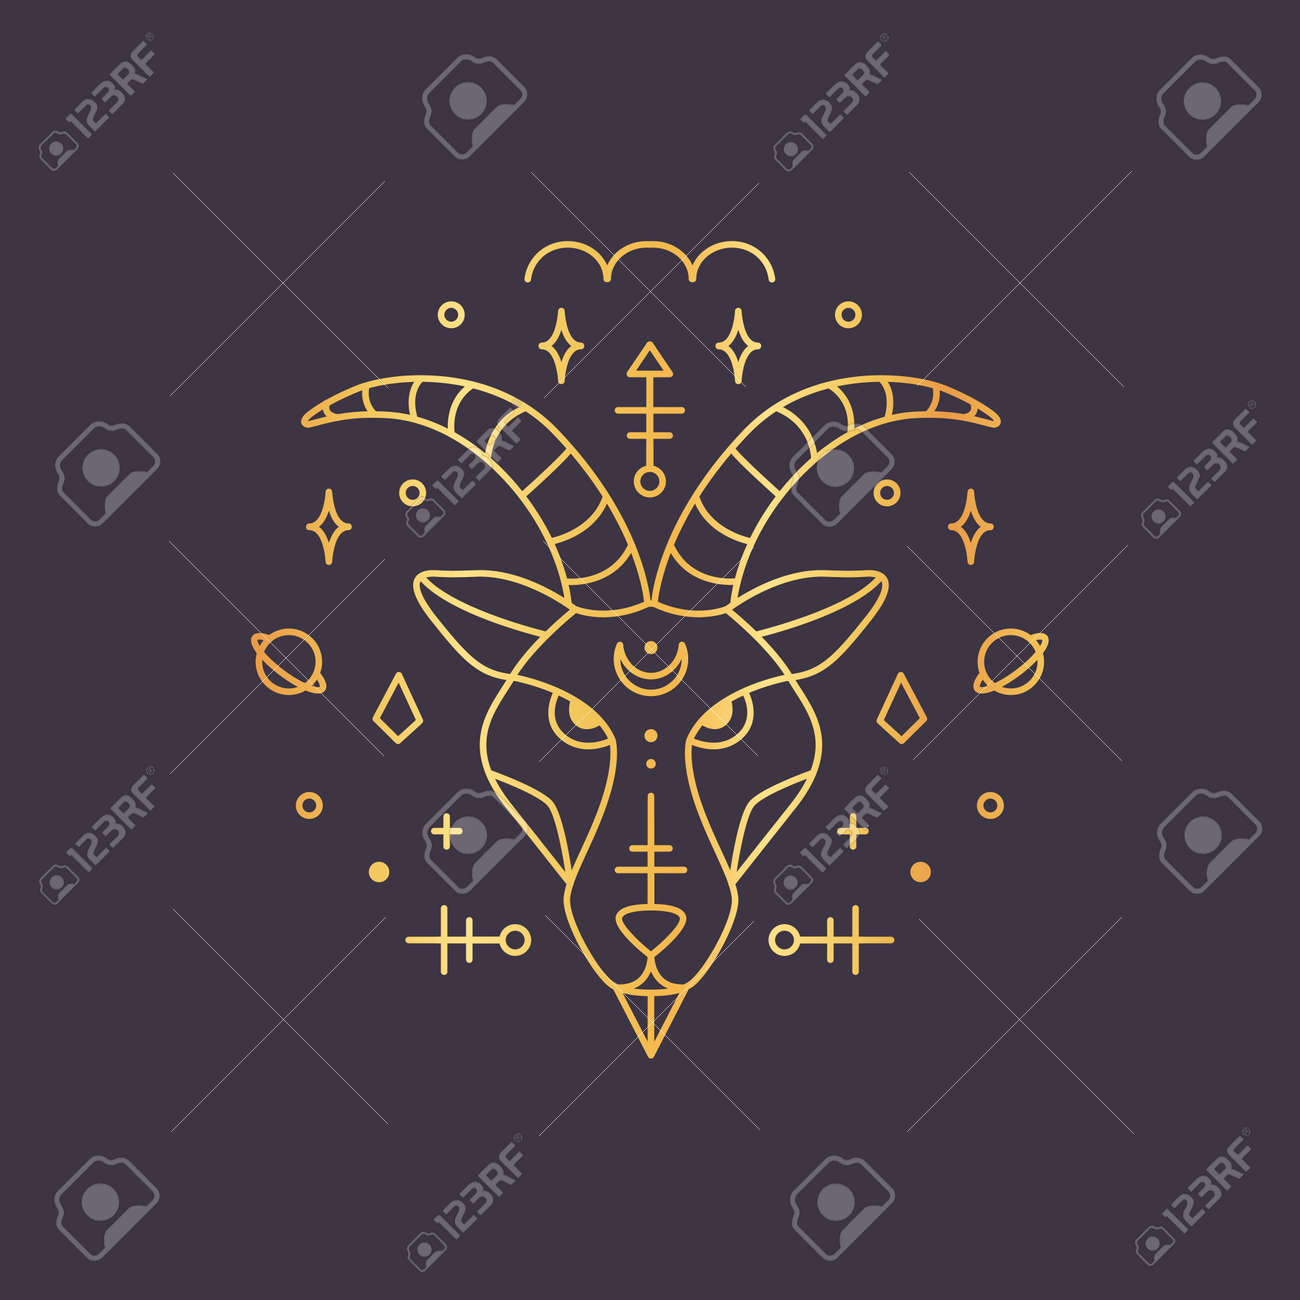 Capricorn zodiac sign, horoscope symbol golden. Vector illustration - 135502935